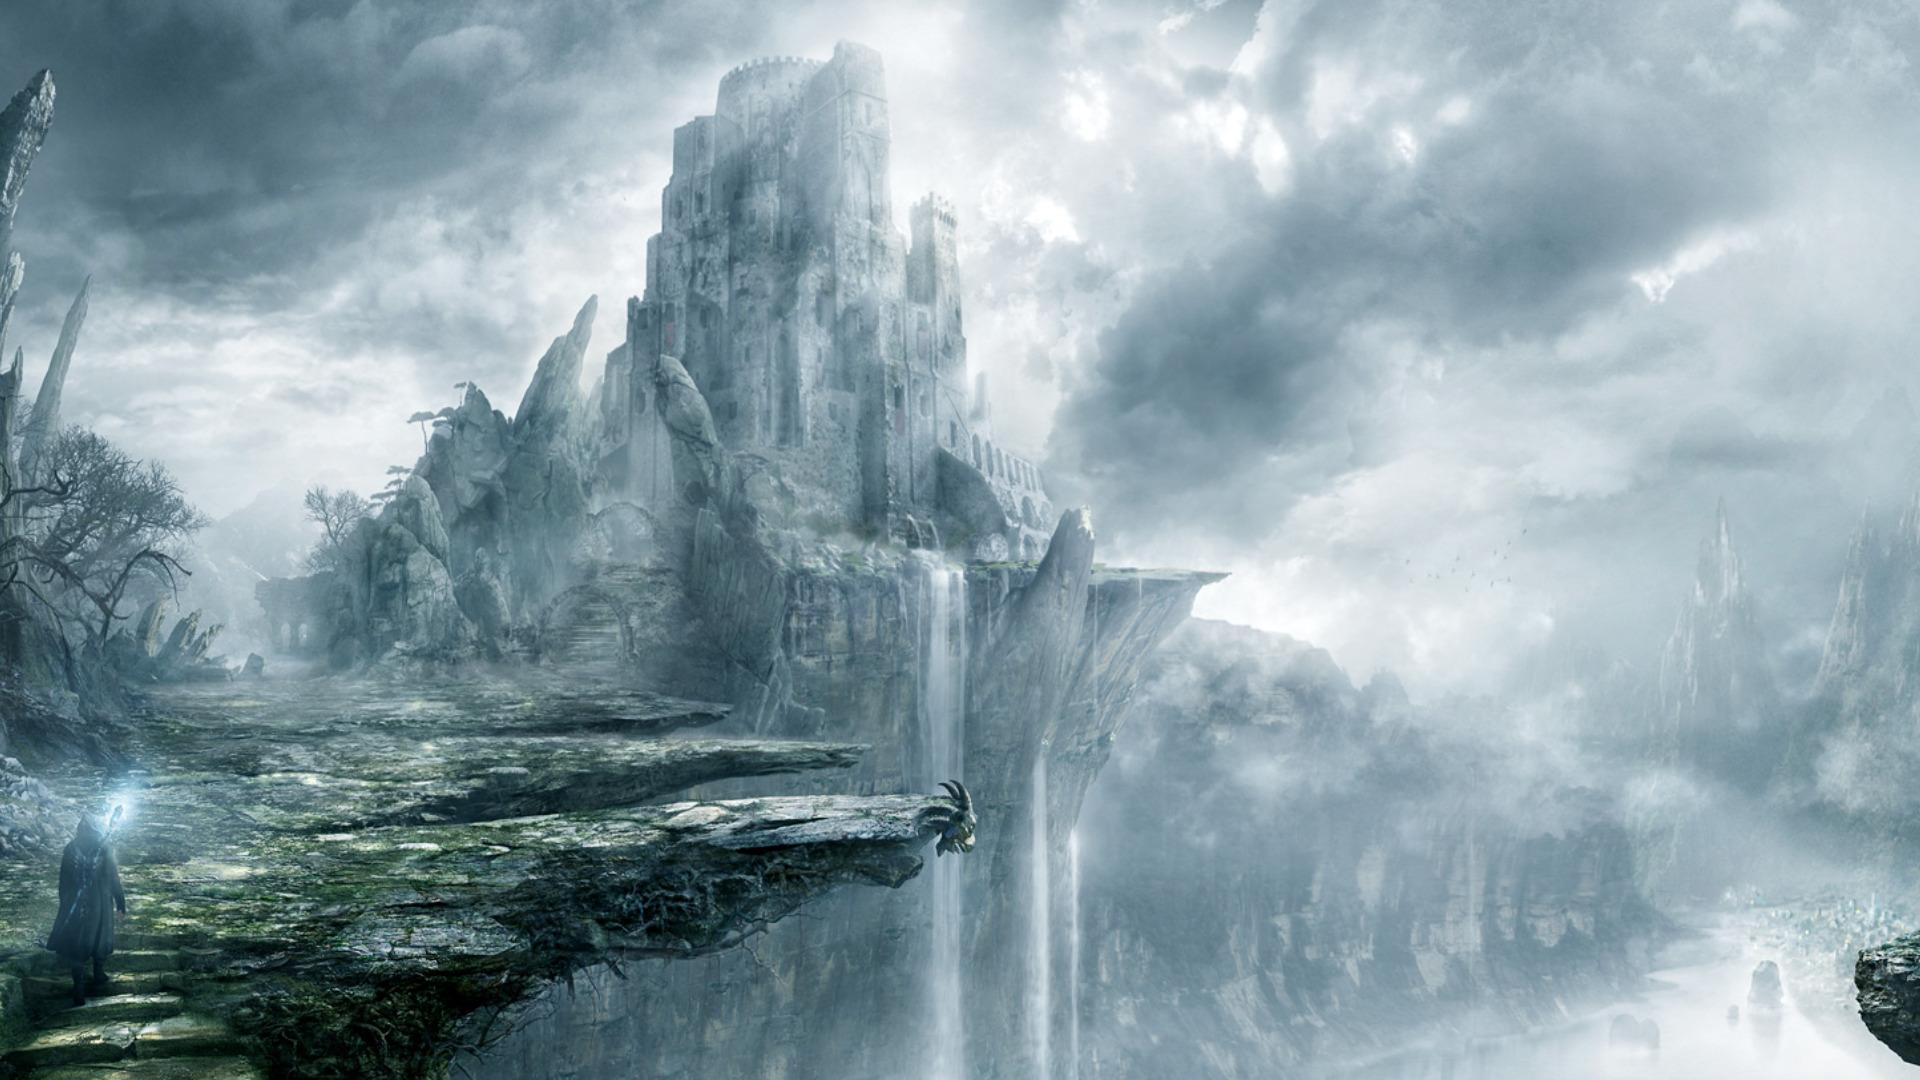 Fantasy Landscape HD Wallpaper Picture Image